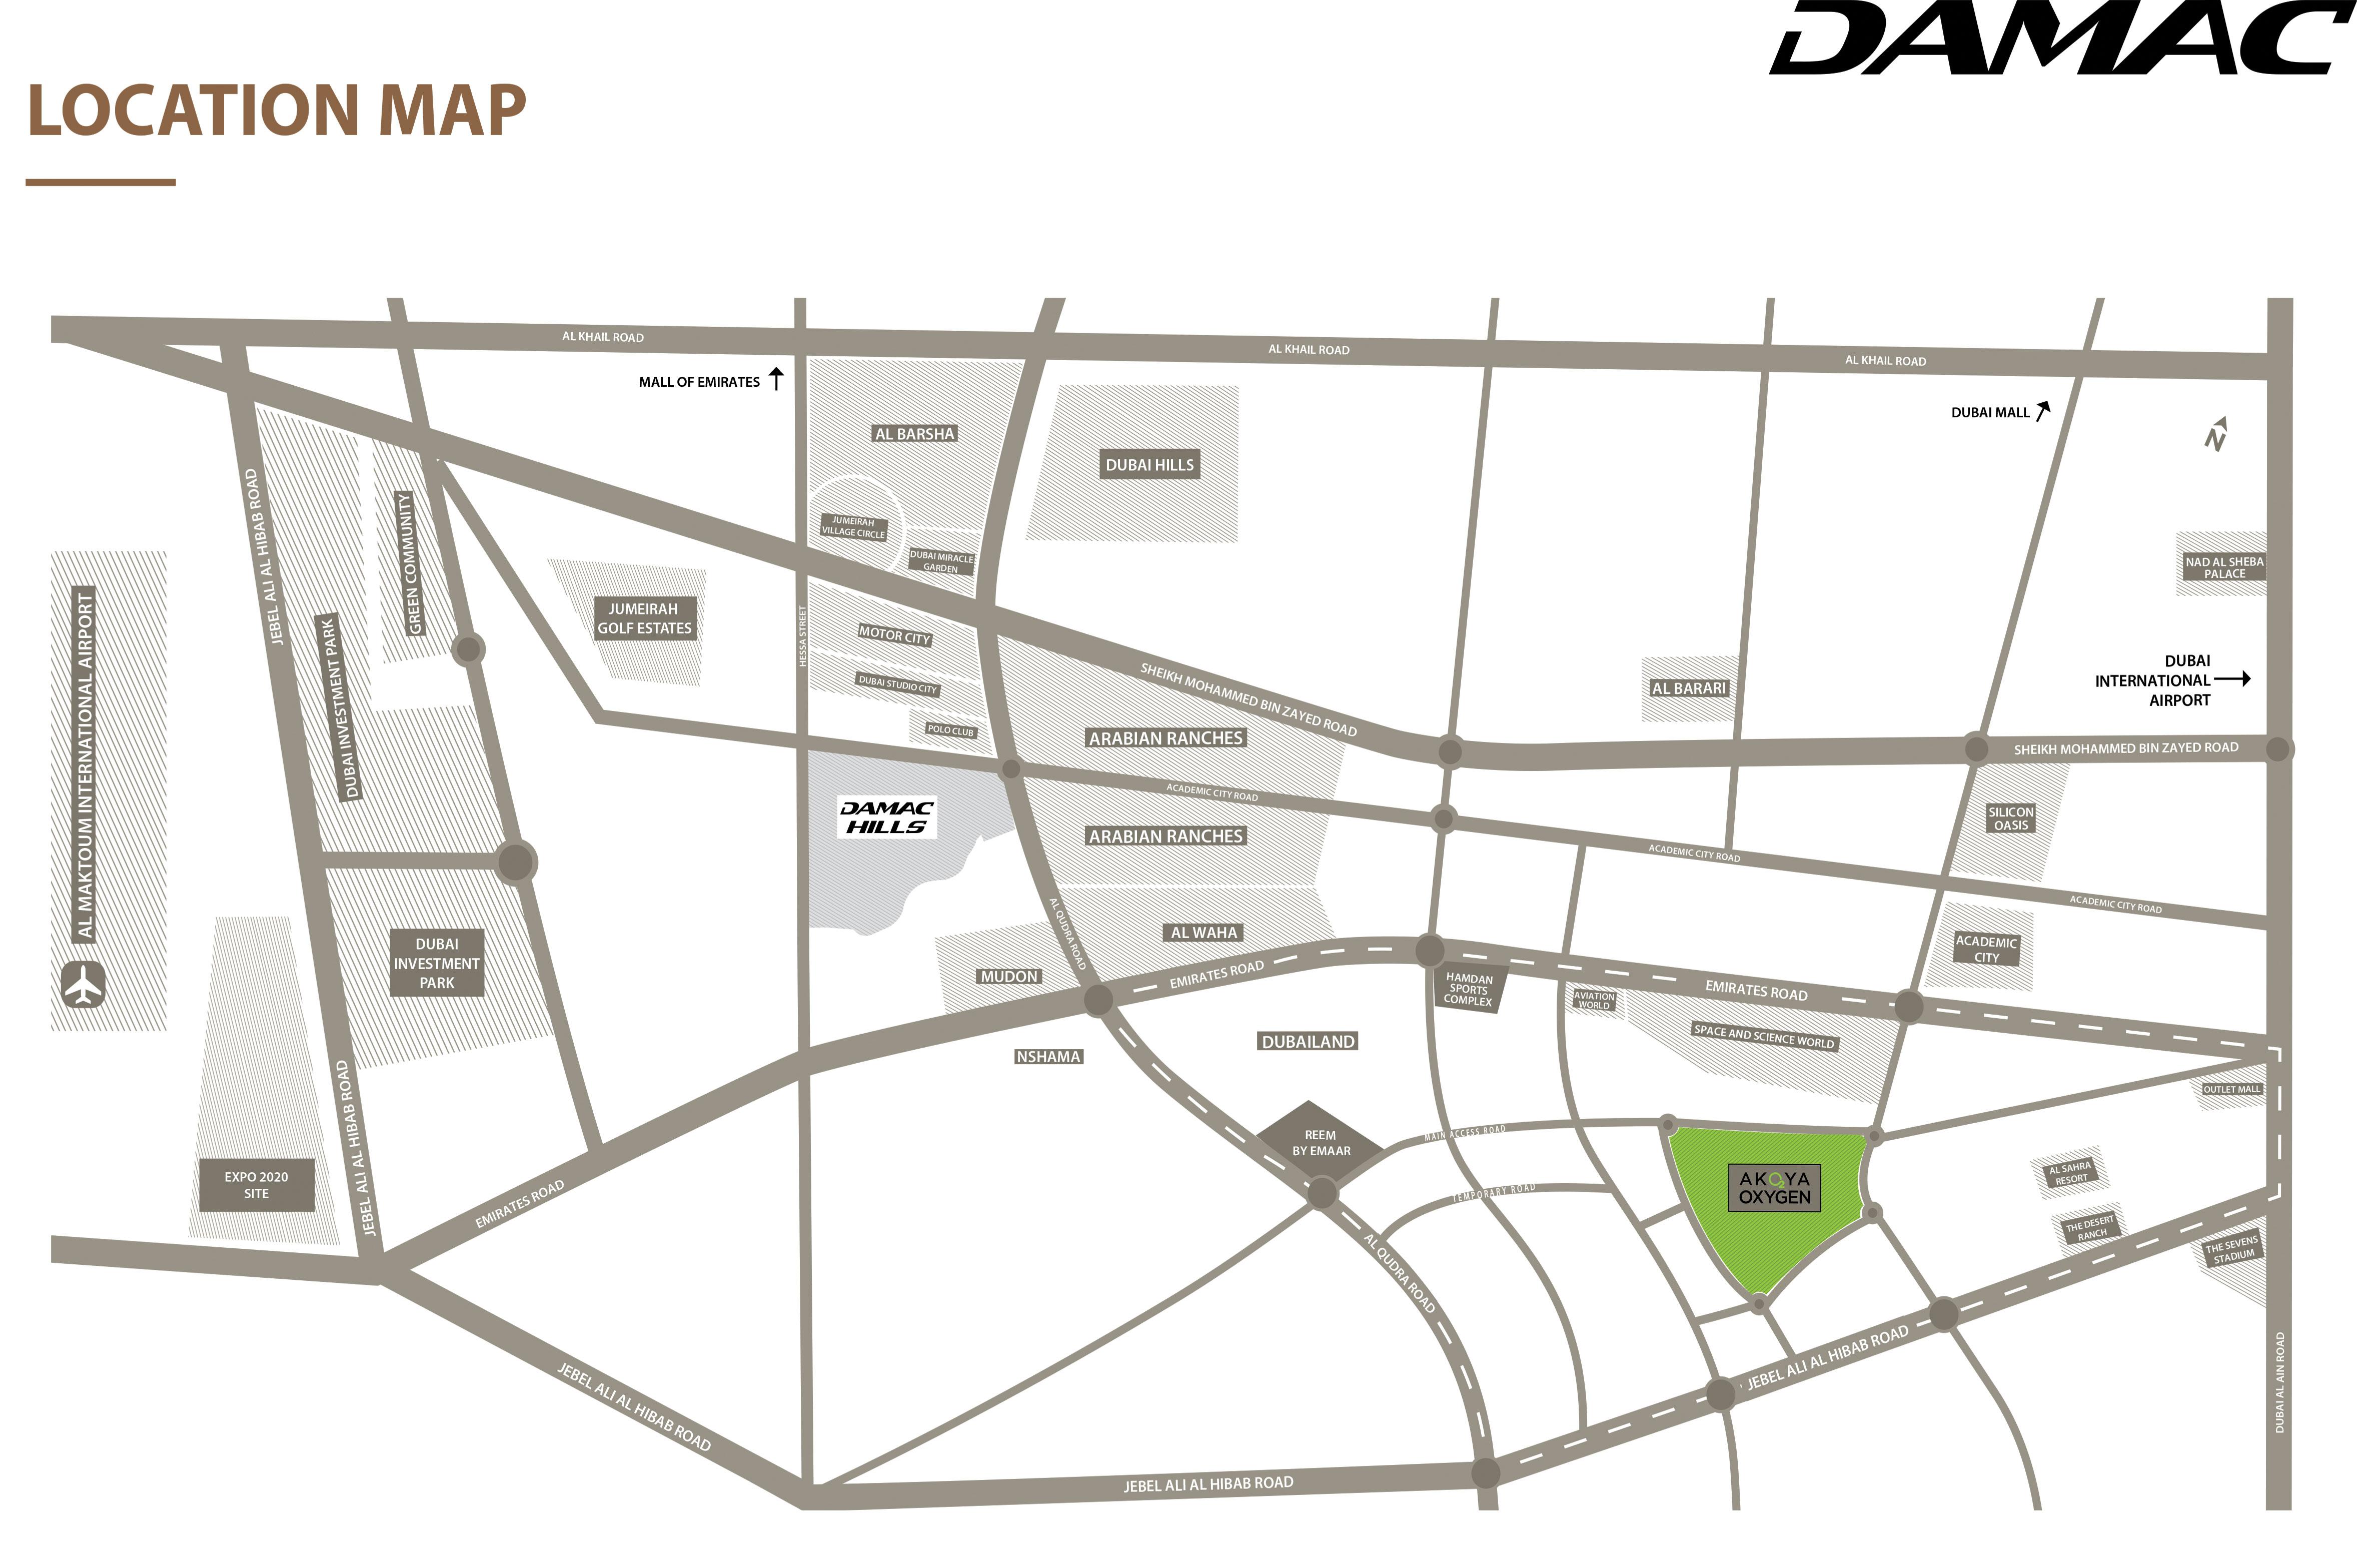 Bait-Al-Aseel-Villas Location Map